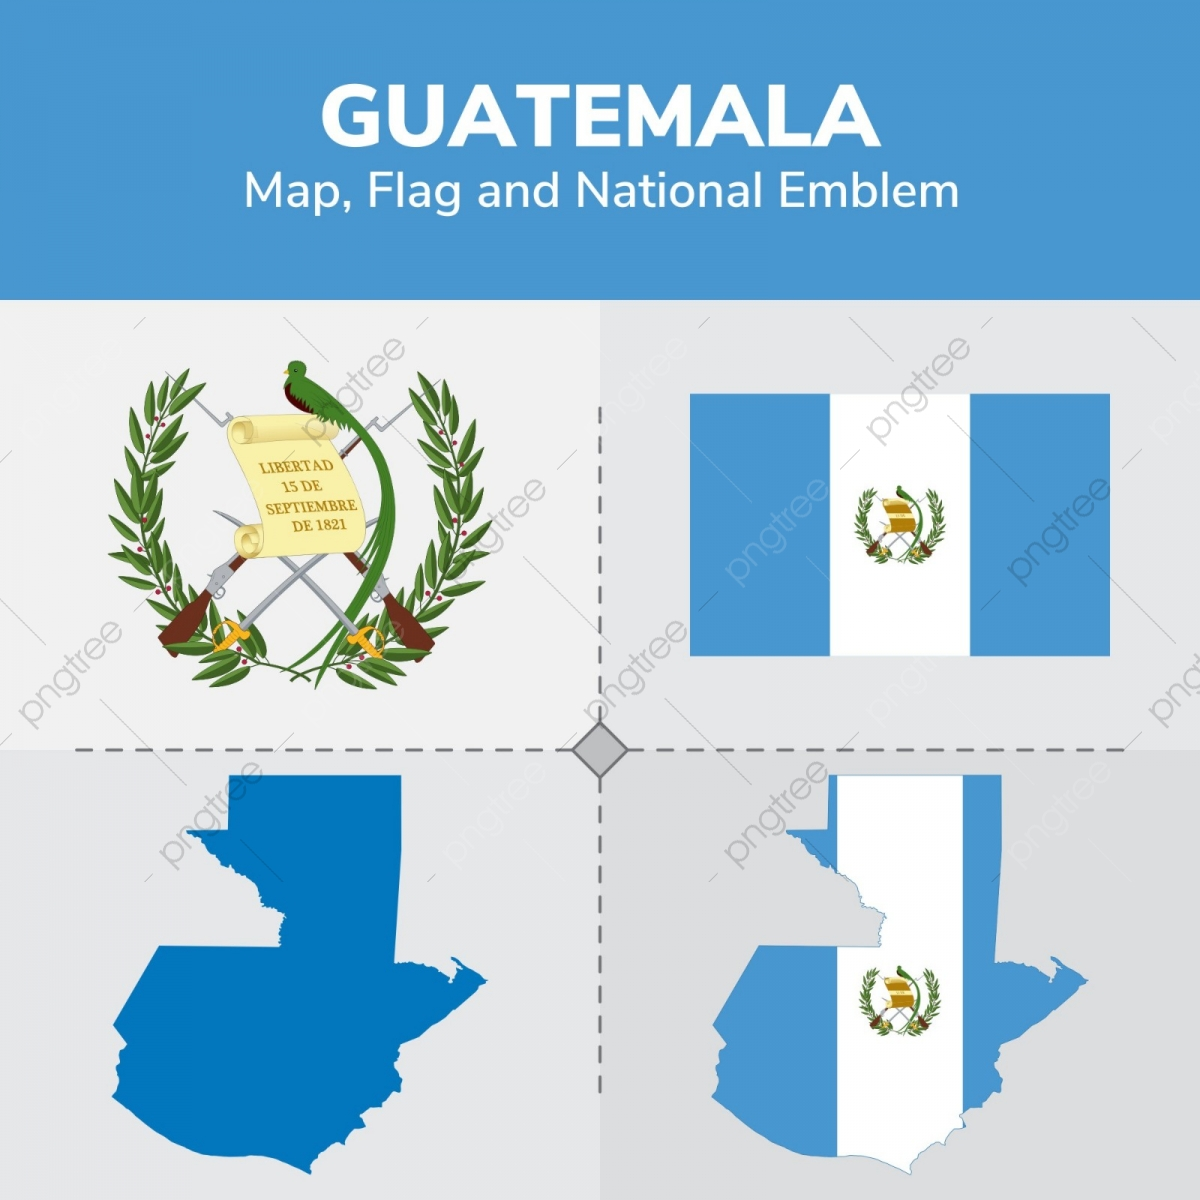 Guatemala Karte.Guatemala Karte Flagge Und Nationale Emblem Kontinente Länder